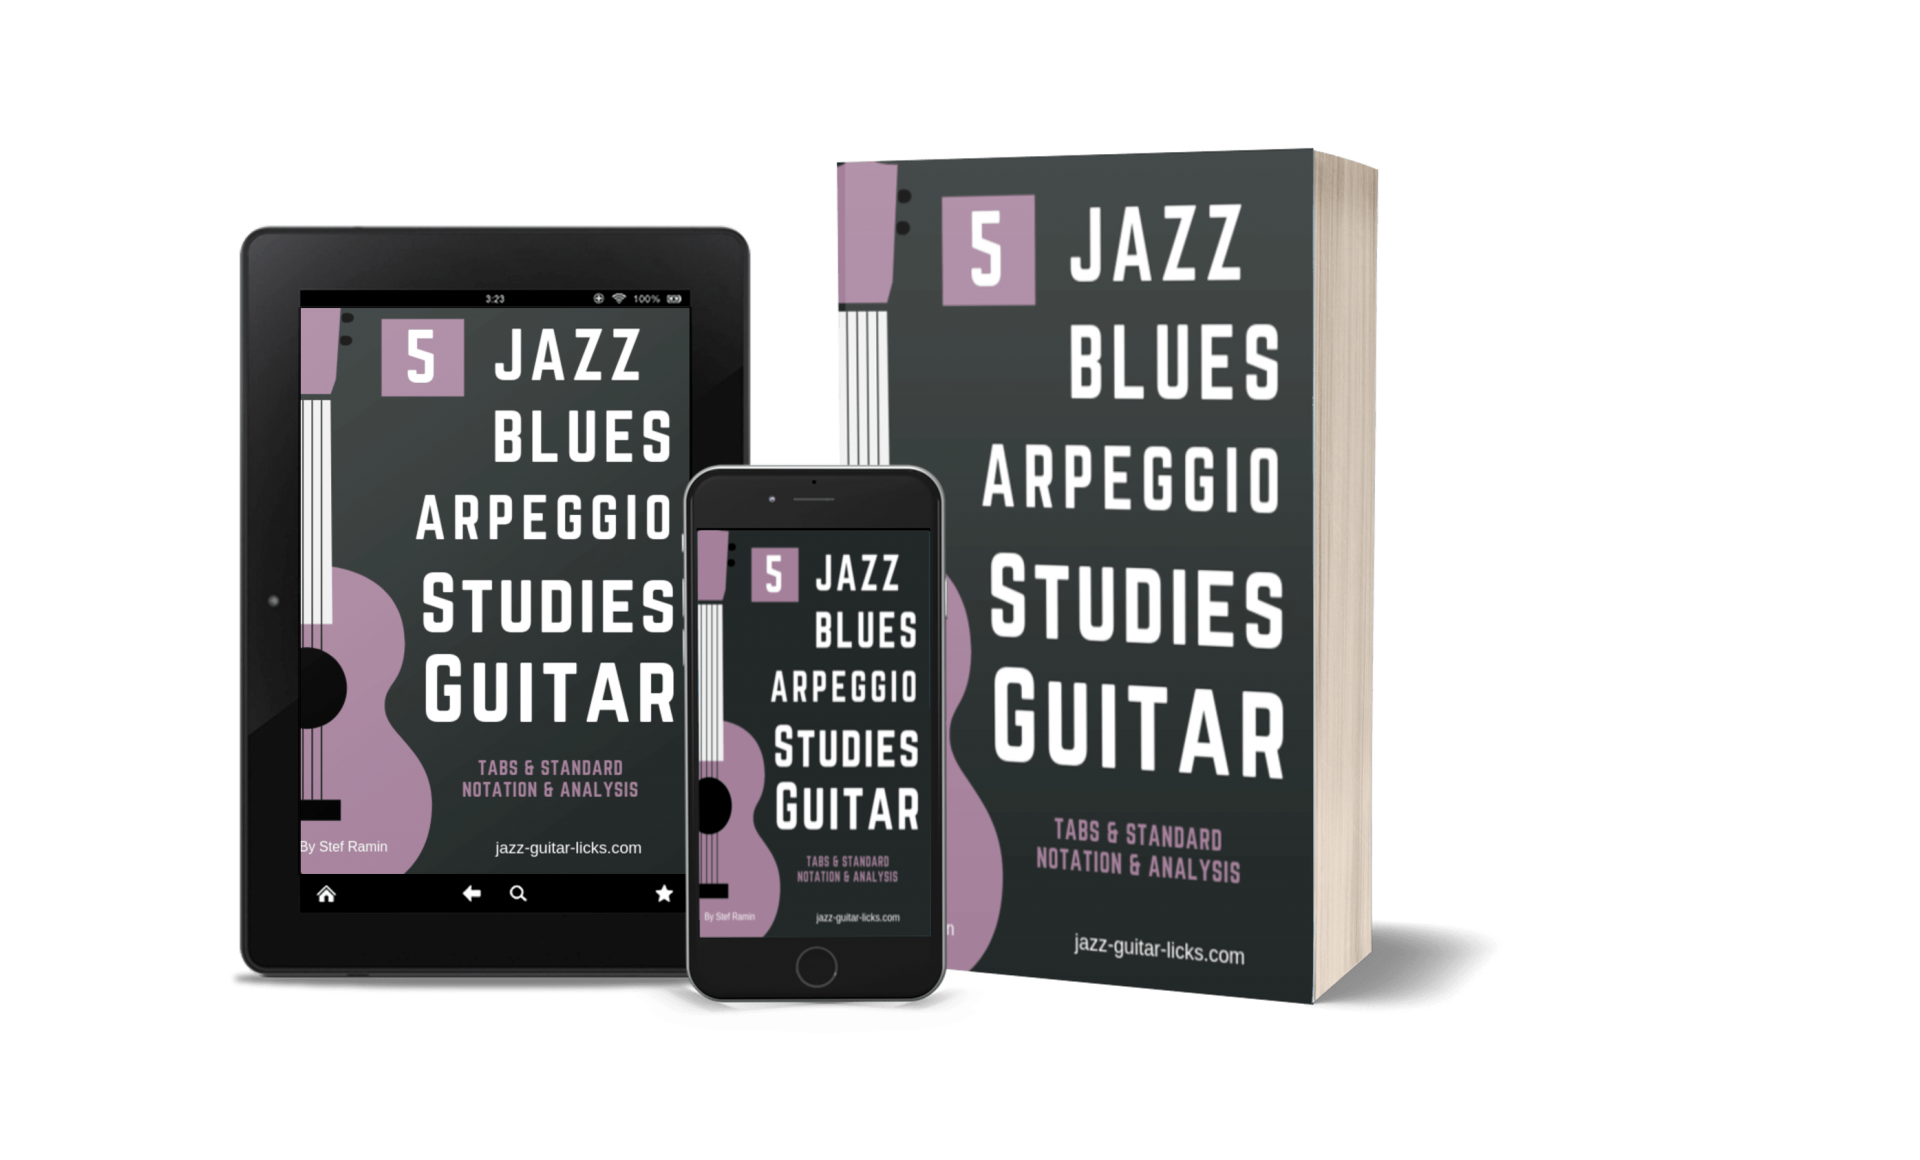 5 jazz blues arpeggio studies guitar PDF eBook